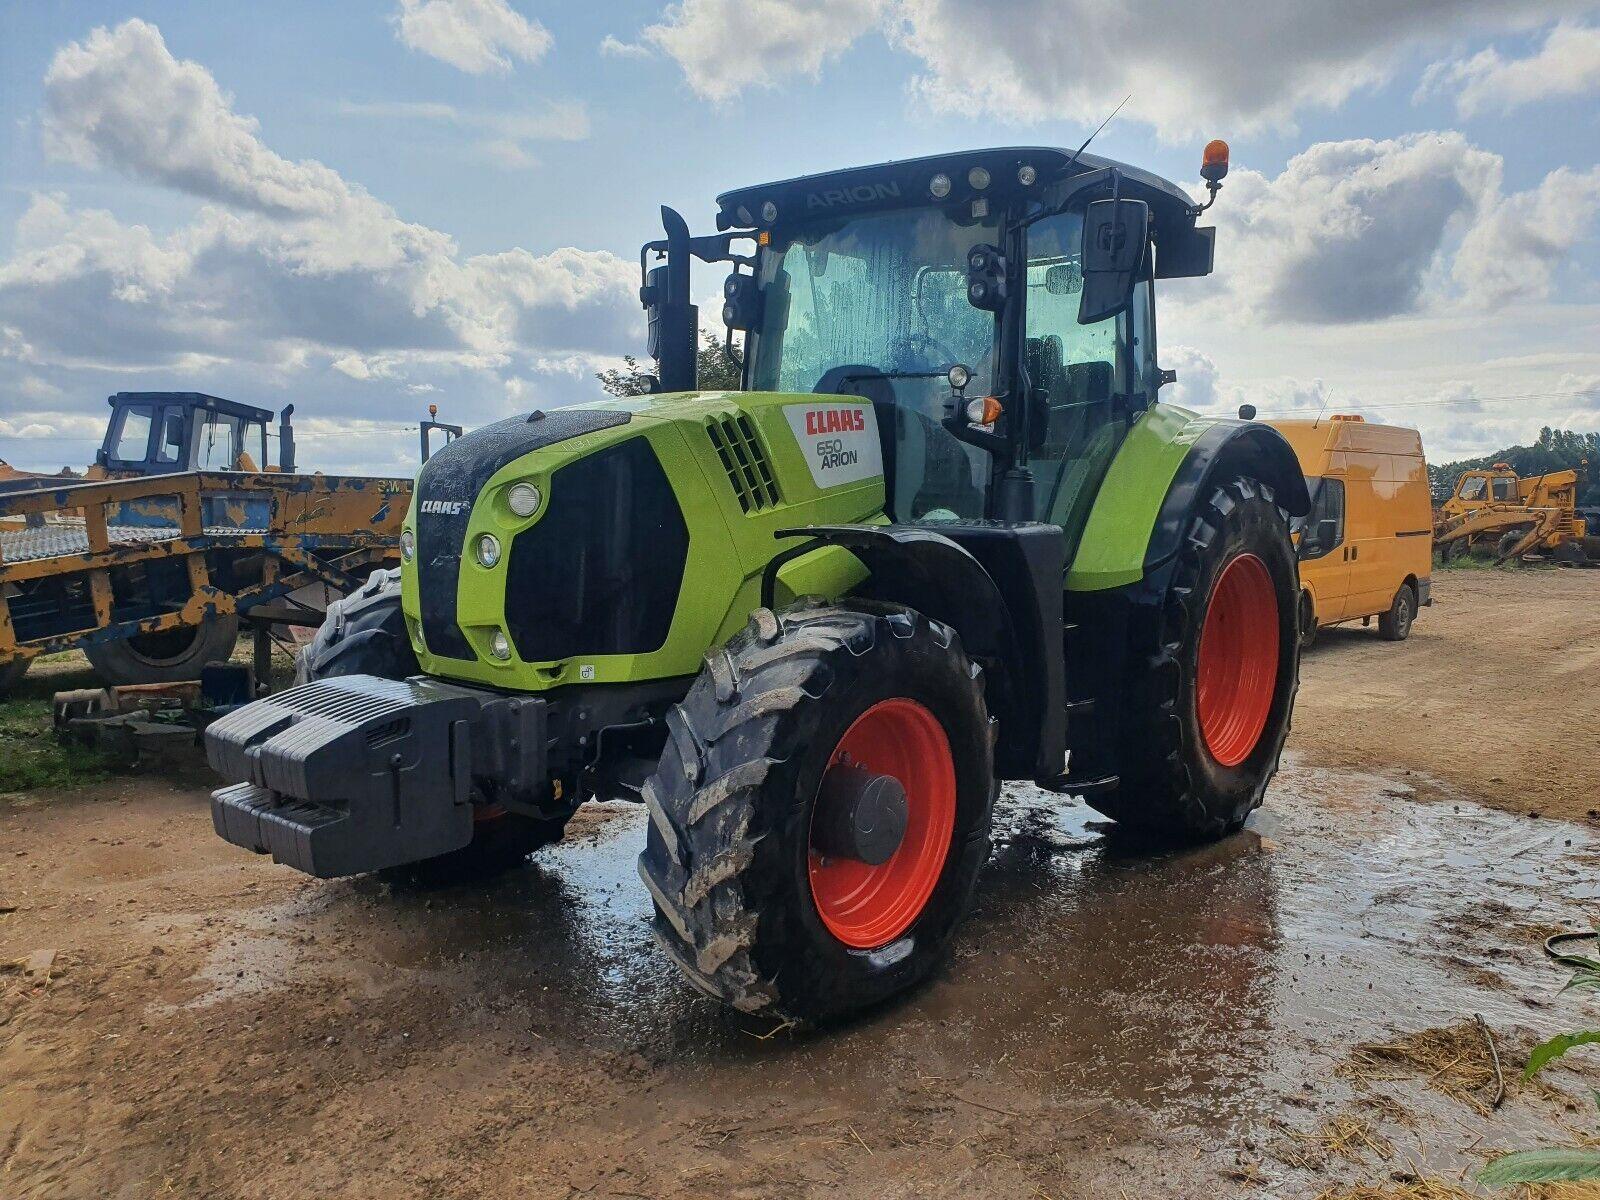 2018 Claas Arion 650 4x4 tractor 18 reg , 50k, air brakes